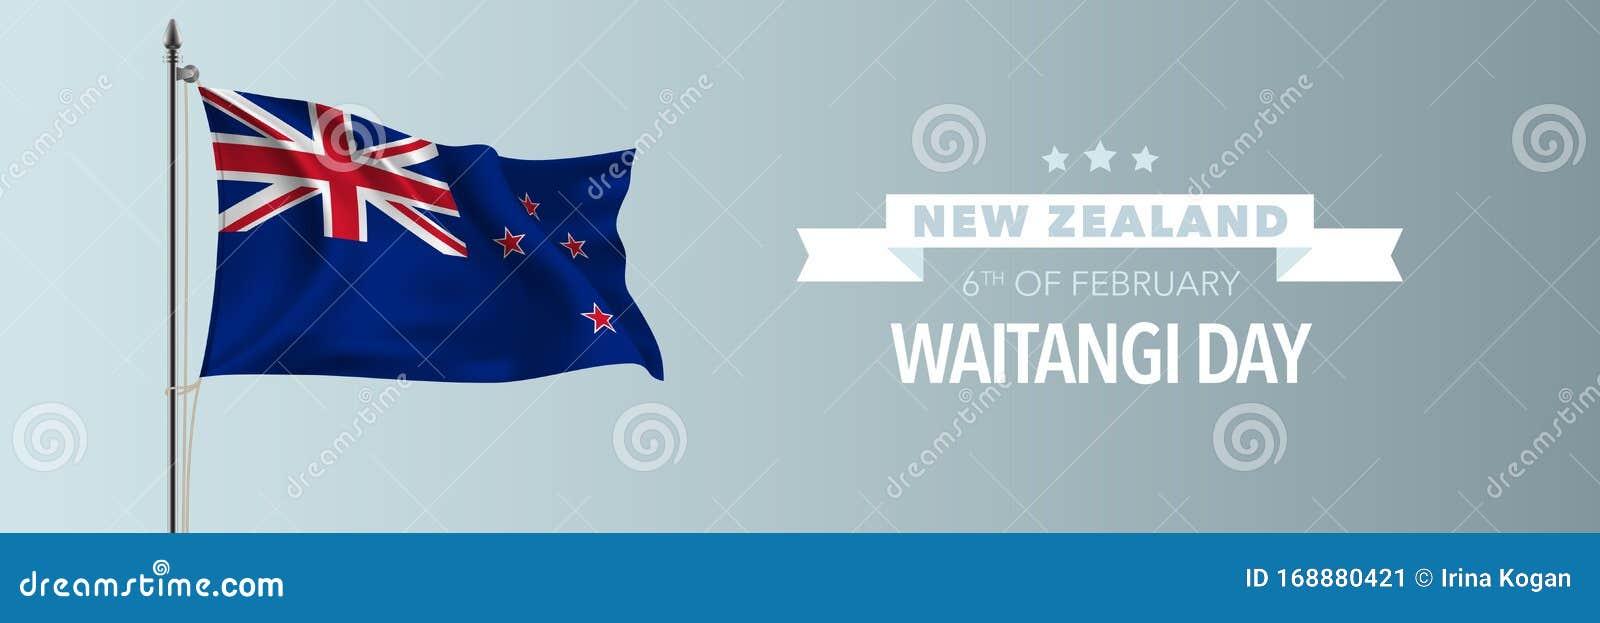 new zealand happy waitangi day greeting card banner